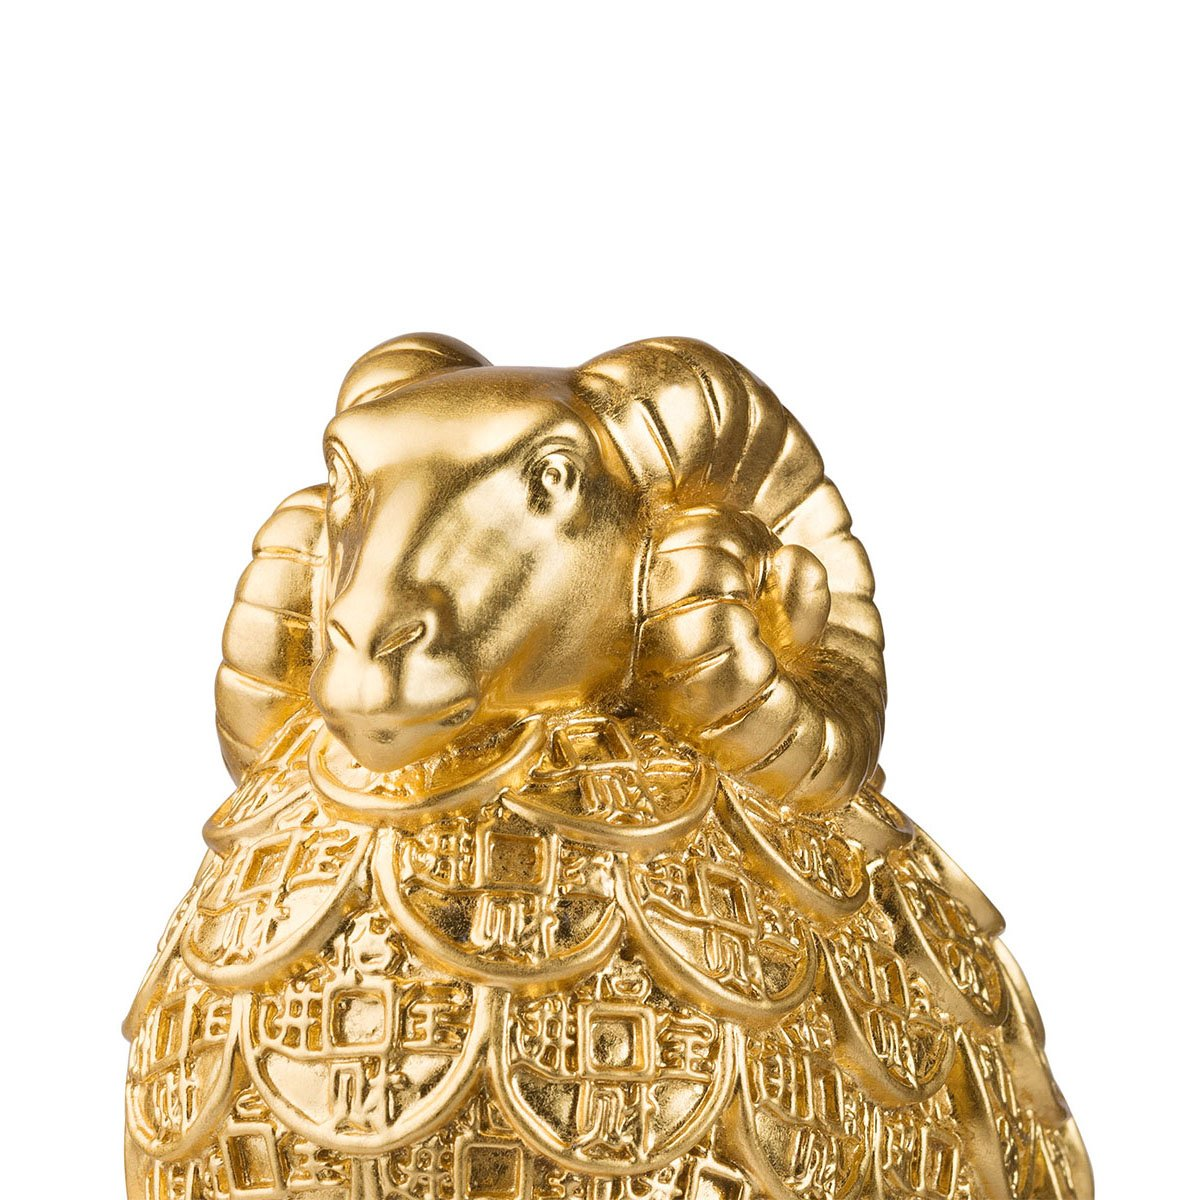 brassmaster fortuna Golden ovejas Estatua Artware Furnishing ...